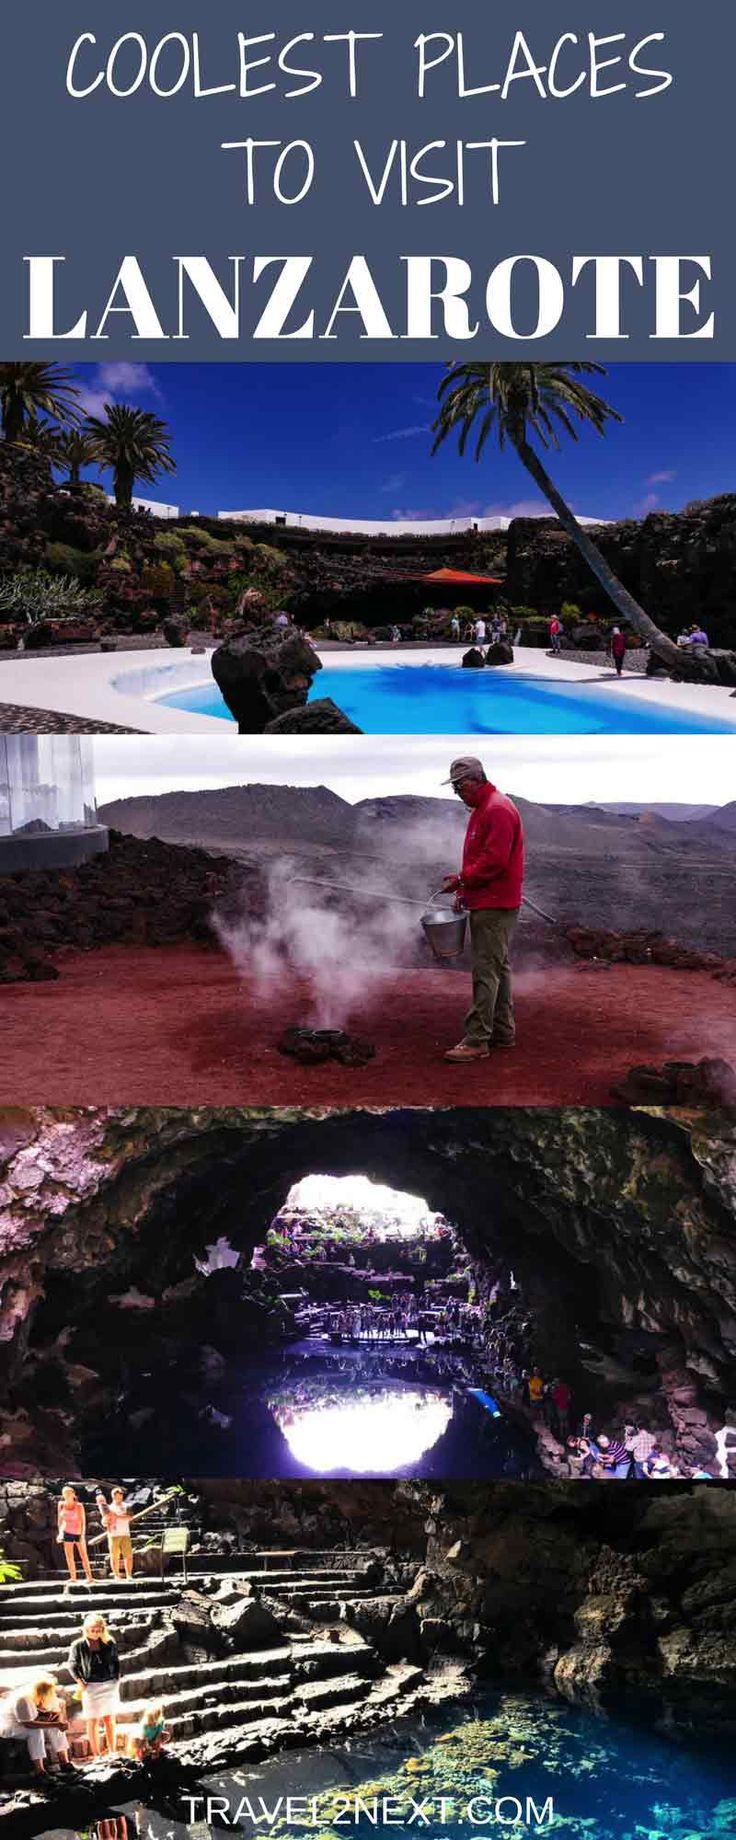 Lanzarote Attractions: Coolest Spots To Visit In the Canary Islands. Visit the Canary Islands. https://travel2next.com/lanzarote-attractions-canary-islands/?utm_campaign=coschedule&utm_source=pinterest&utm_medium=Travel%202%20Next&utm_content=Lanzarote%20Attractions%3A%20Coolest%20Spots%20To%20Visit%20In%20the%20Canary%20Islands